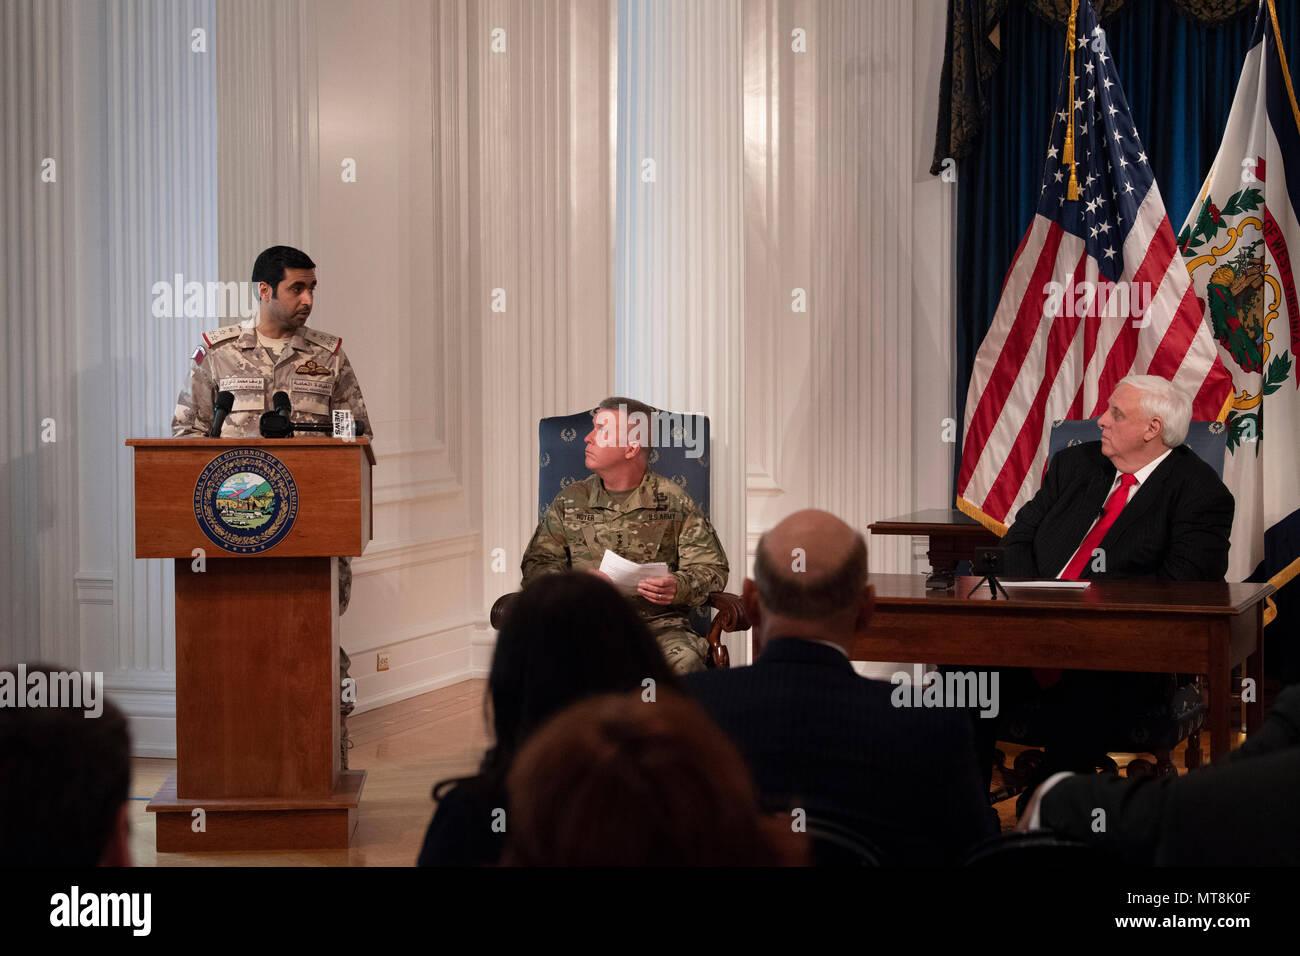 Brig  Gen  Yousef Al Kuwari, the Qatar Defense Attaché speaks to